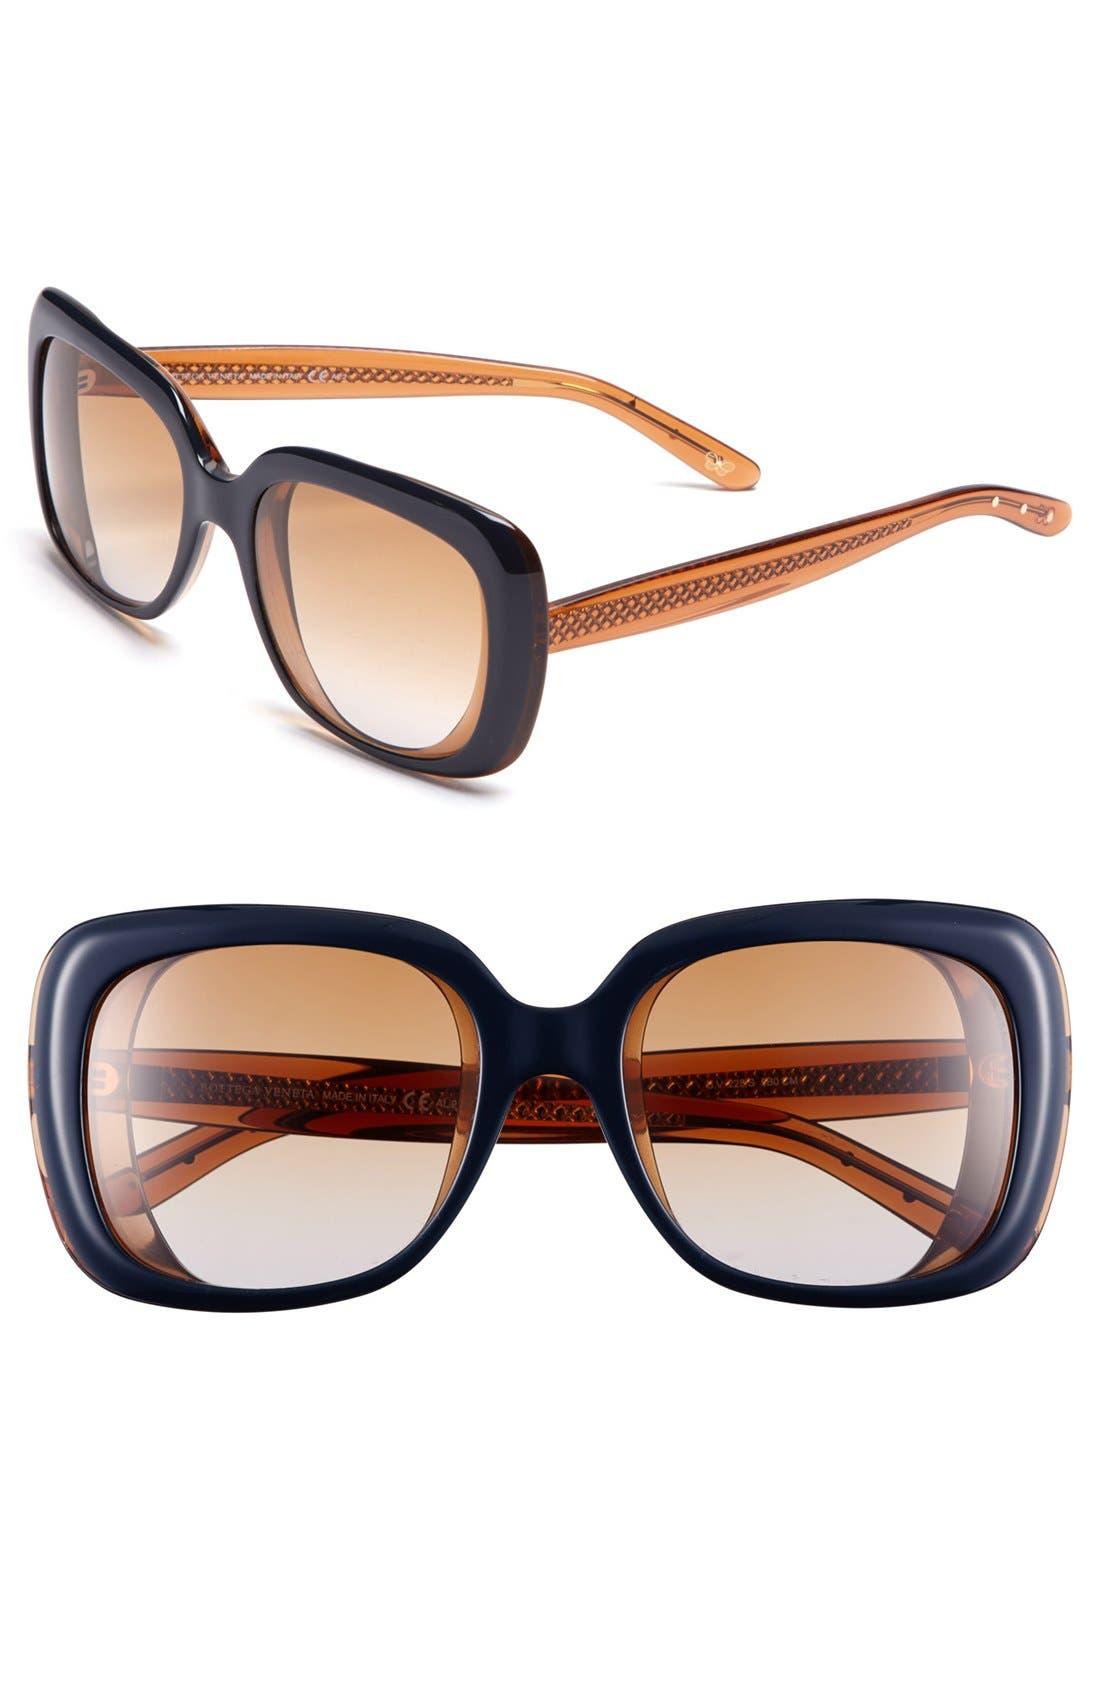 Main Image - Bottega Veneta 56mm Oversized Sunglasses